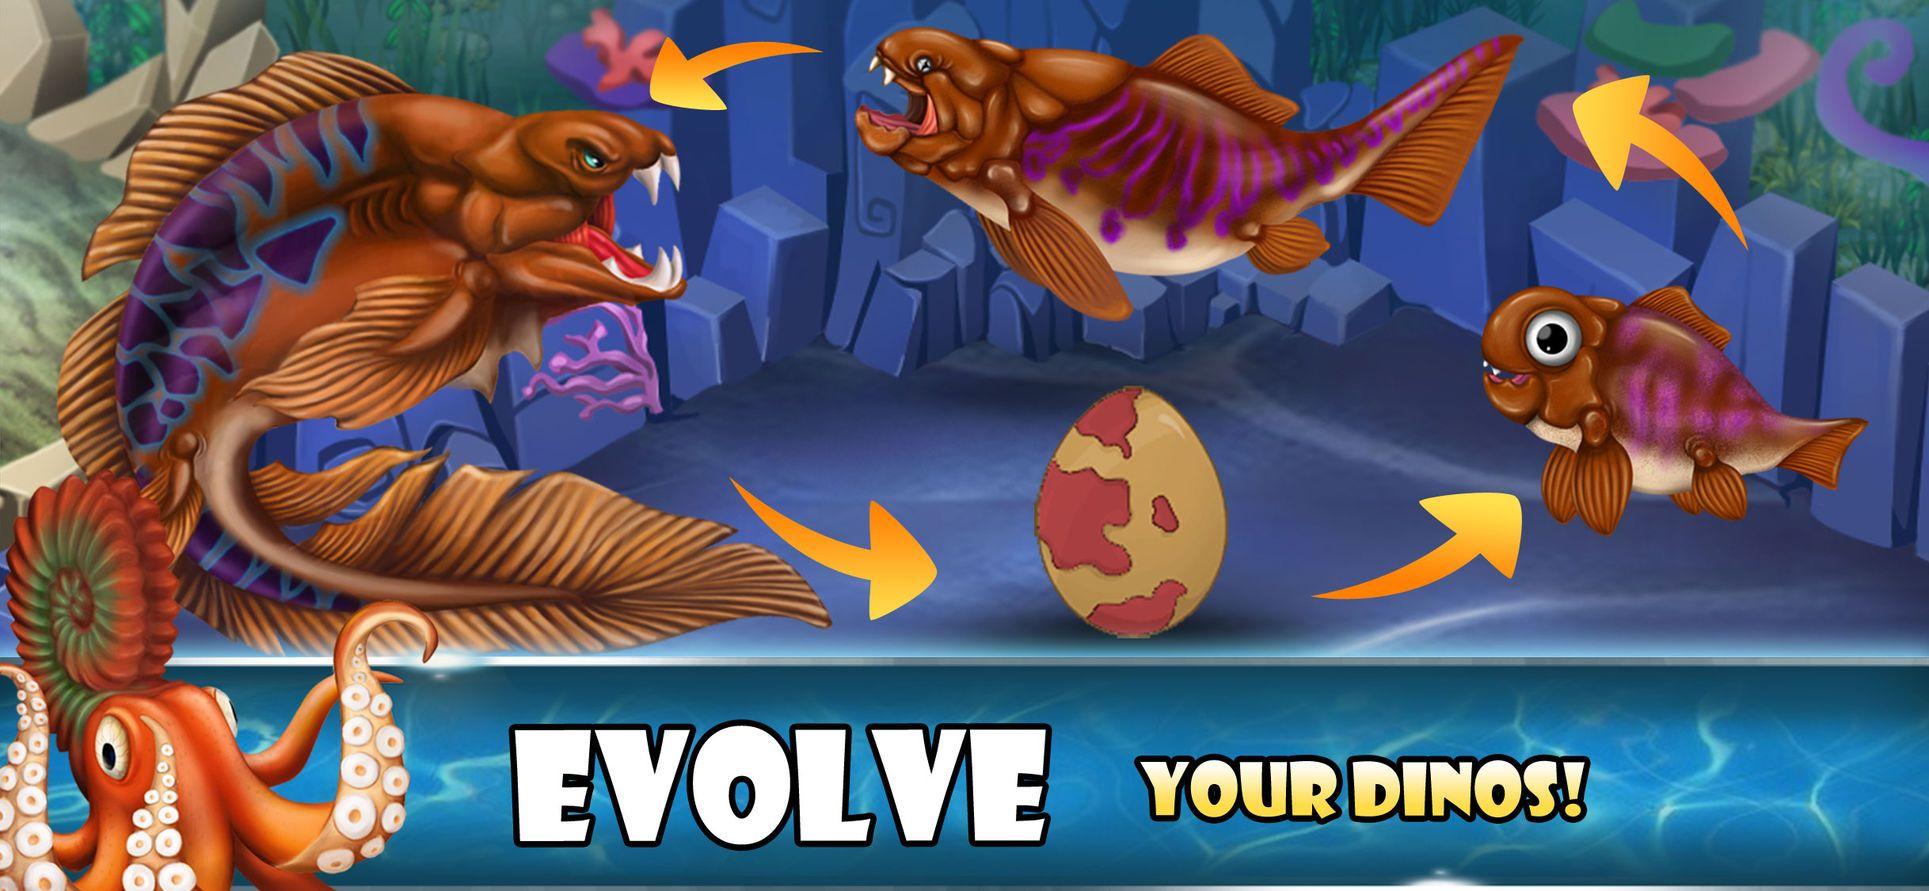 Dino Water WorldJurassic game StrategyGames